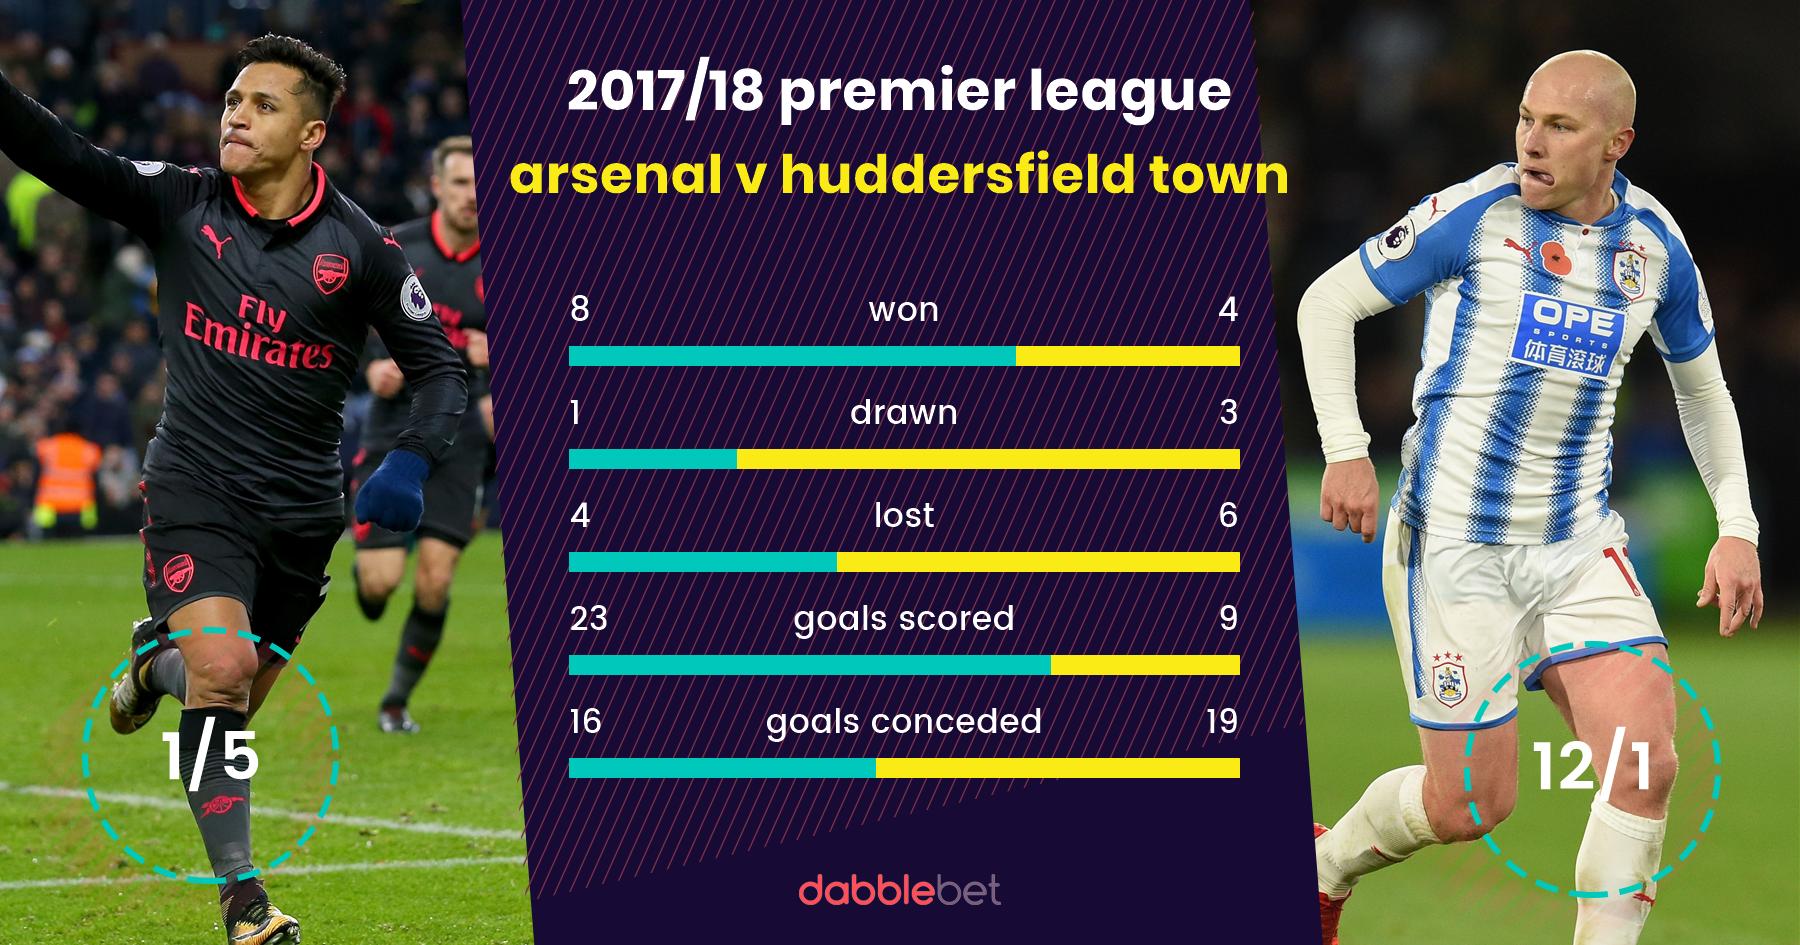 Huddersfield Vs Arsenal: Arsenal V Huddersfield Town: Routine Win For Gunners Over